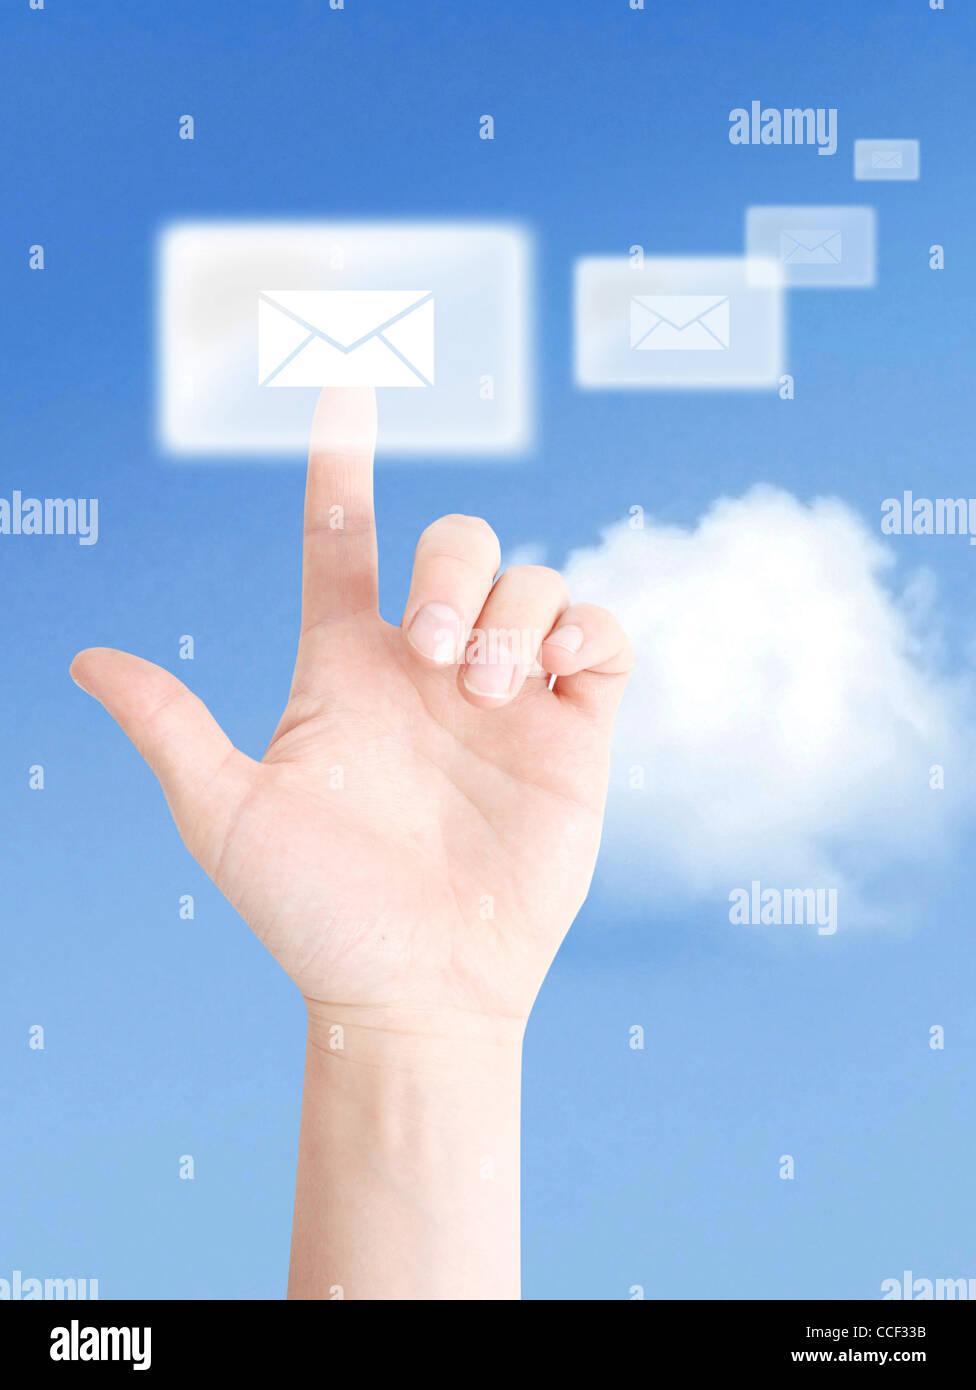 Communication interactive Photo Stock